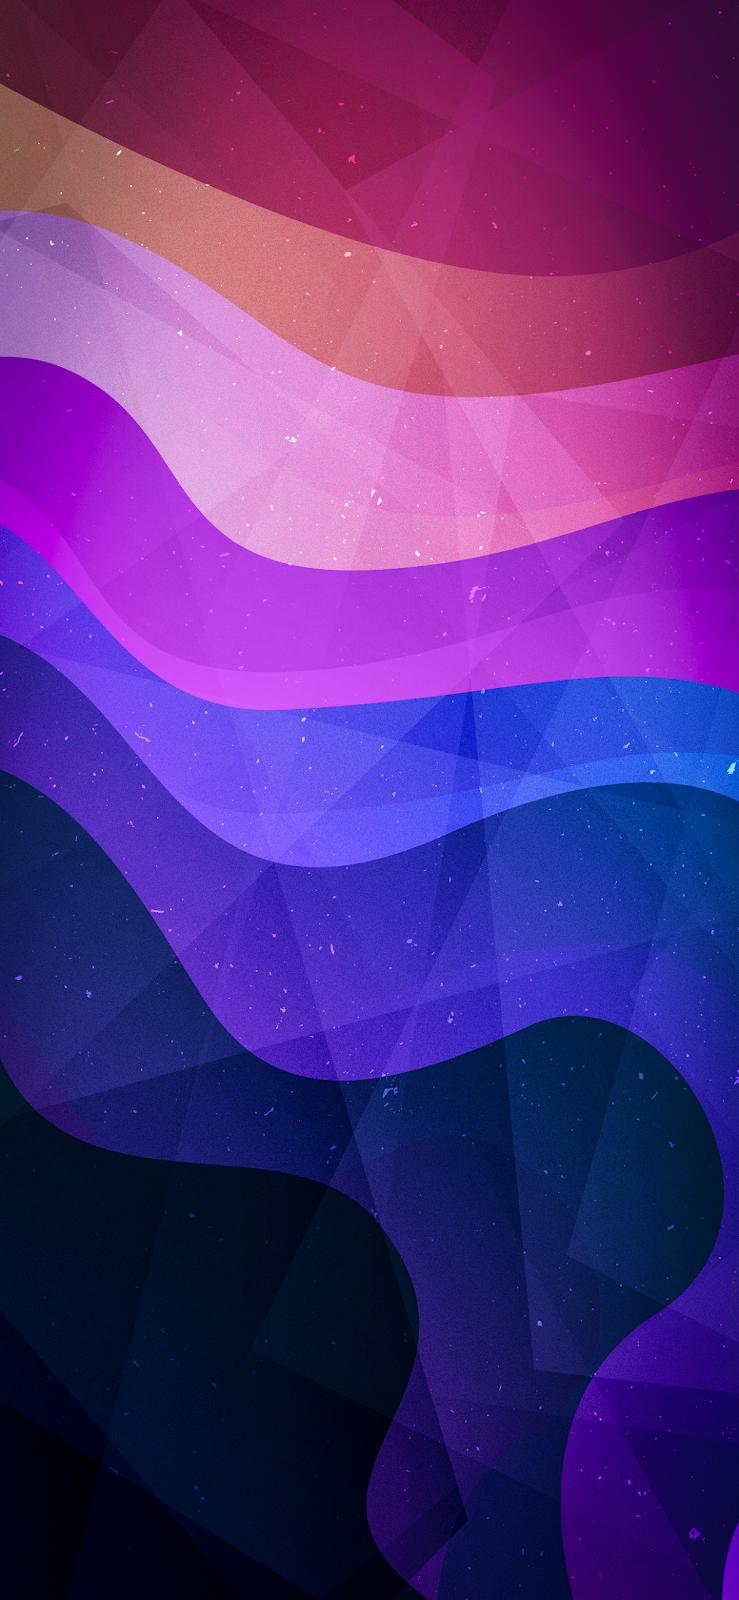 Abstract Paper Style by EvgeniyZemelko (iPhone X)